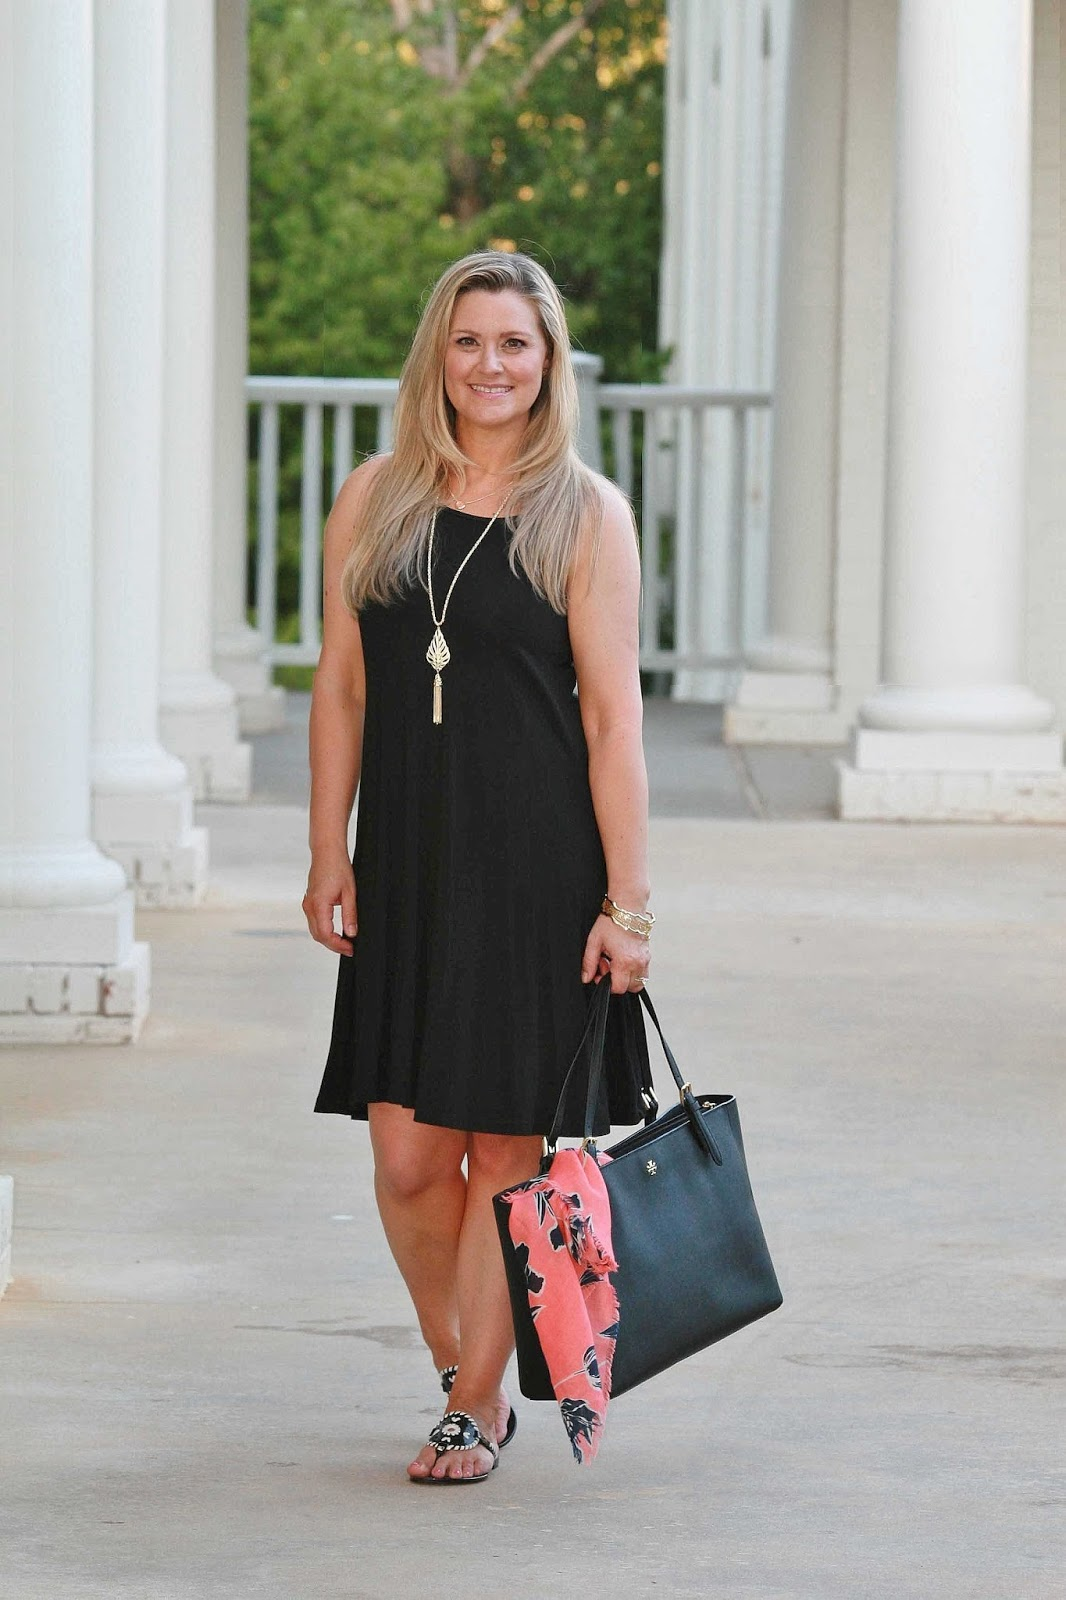 c5e06943dccc1 cute summer dress, jack rogers jellies, Kendra Scott, lbd, little black  dress